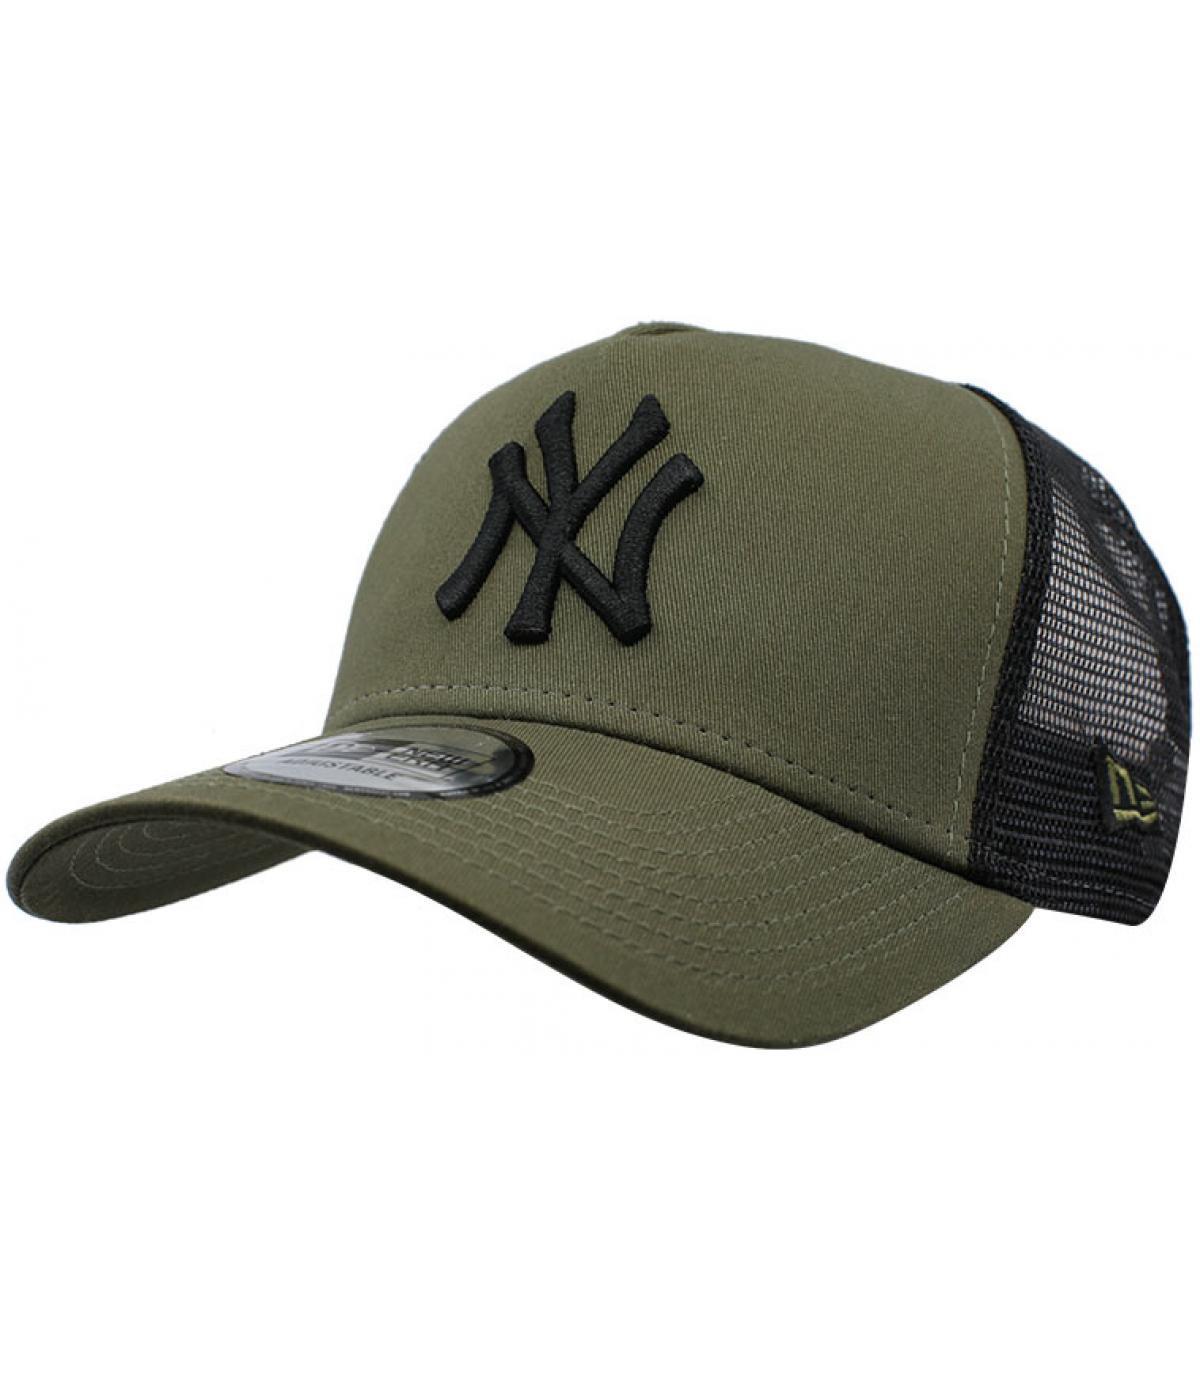 Details Trucker League Ess NY olive black - Abbildung 2